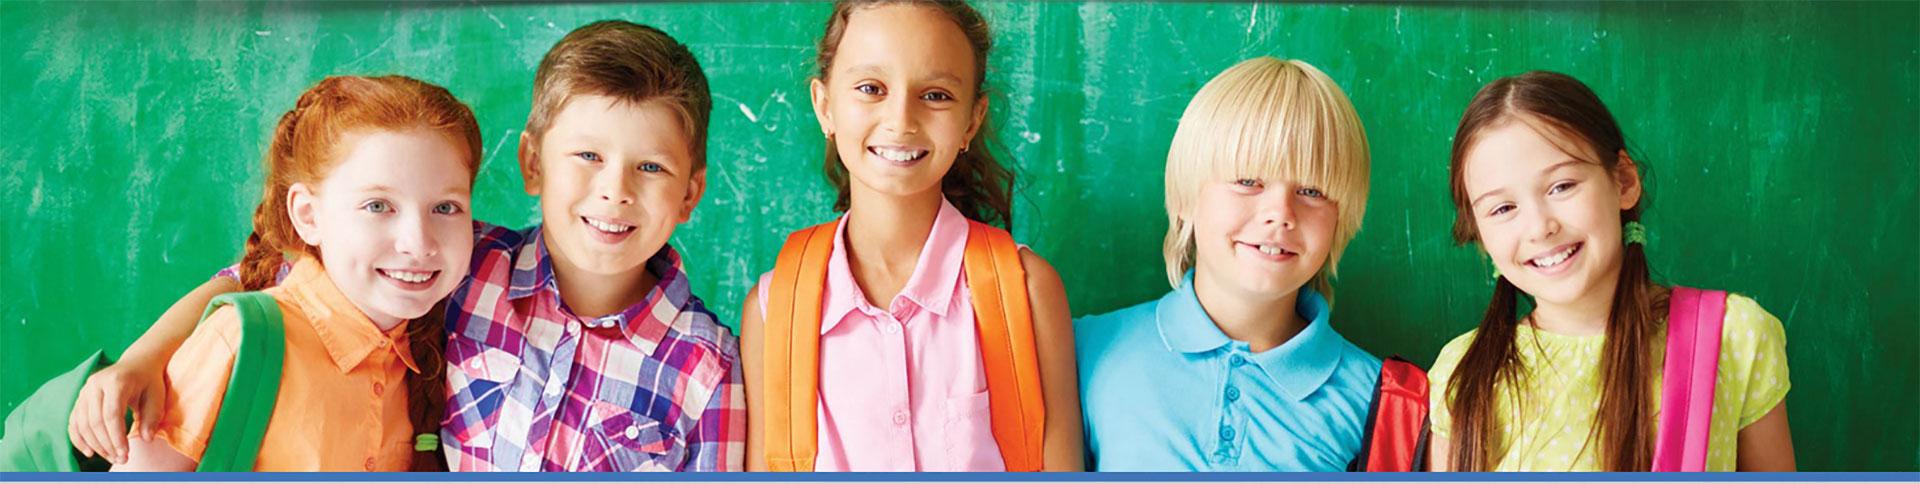 Cruikshank-Orthodontics-Forest-Grove-Hillsboro-OR-Happy-Kids-Smiling-04b